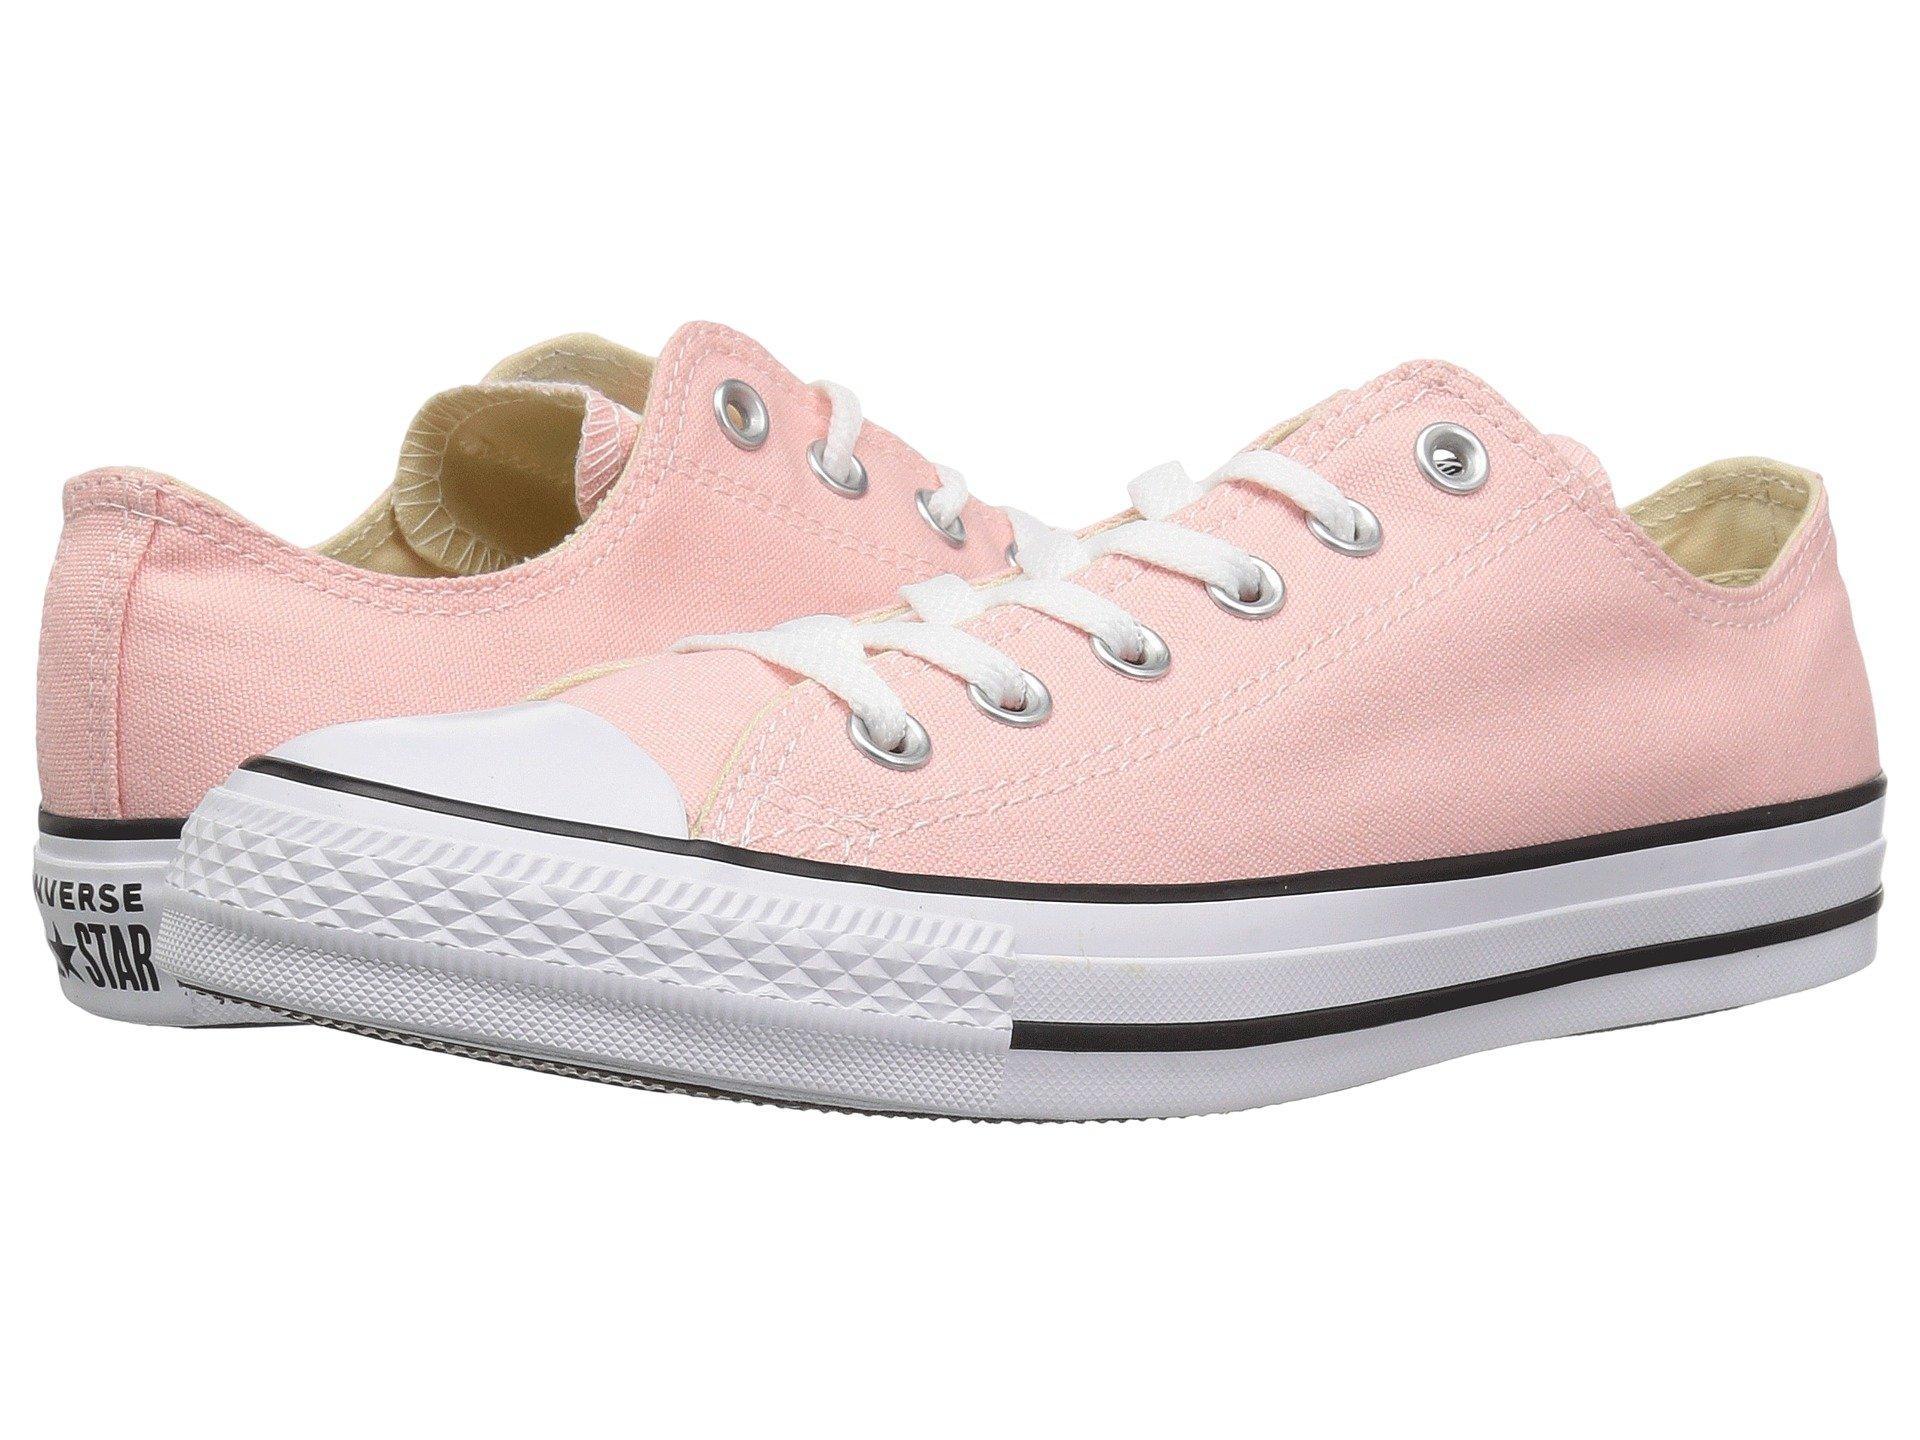 8b72d0a1afe01b Lyst - Converse Chuck Taylor All Star Seasonal Ox in Pink